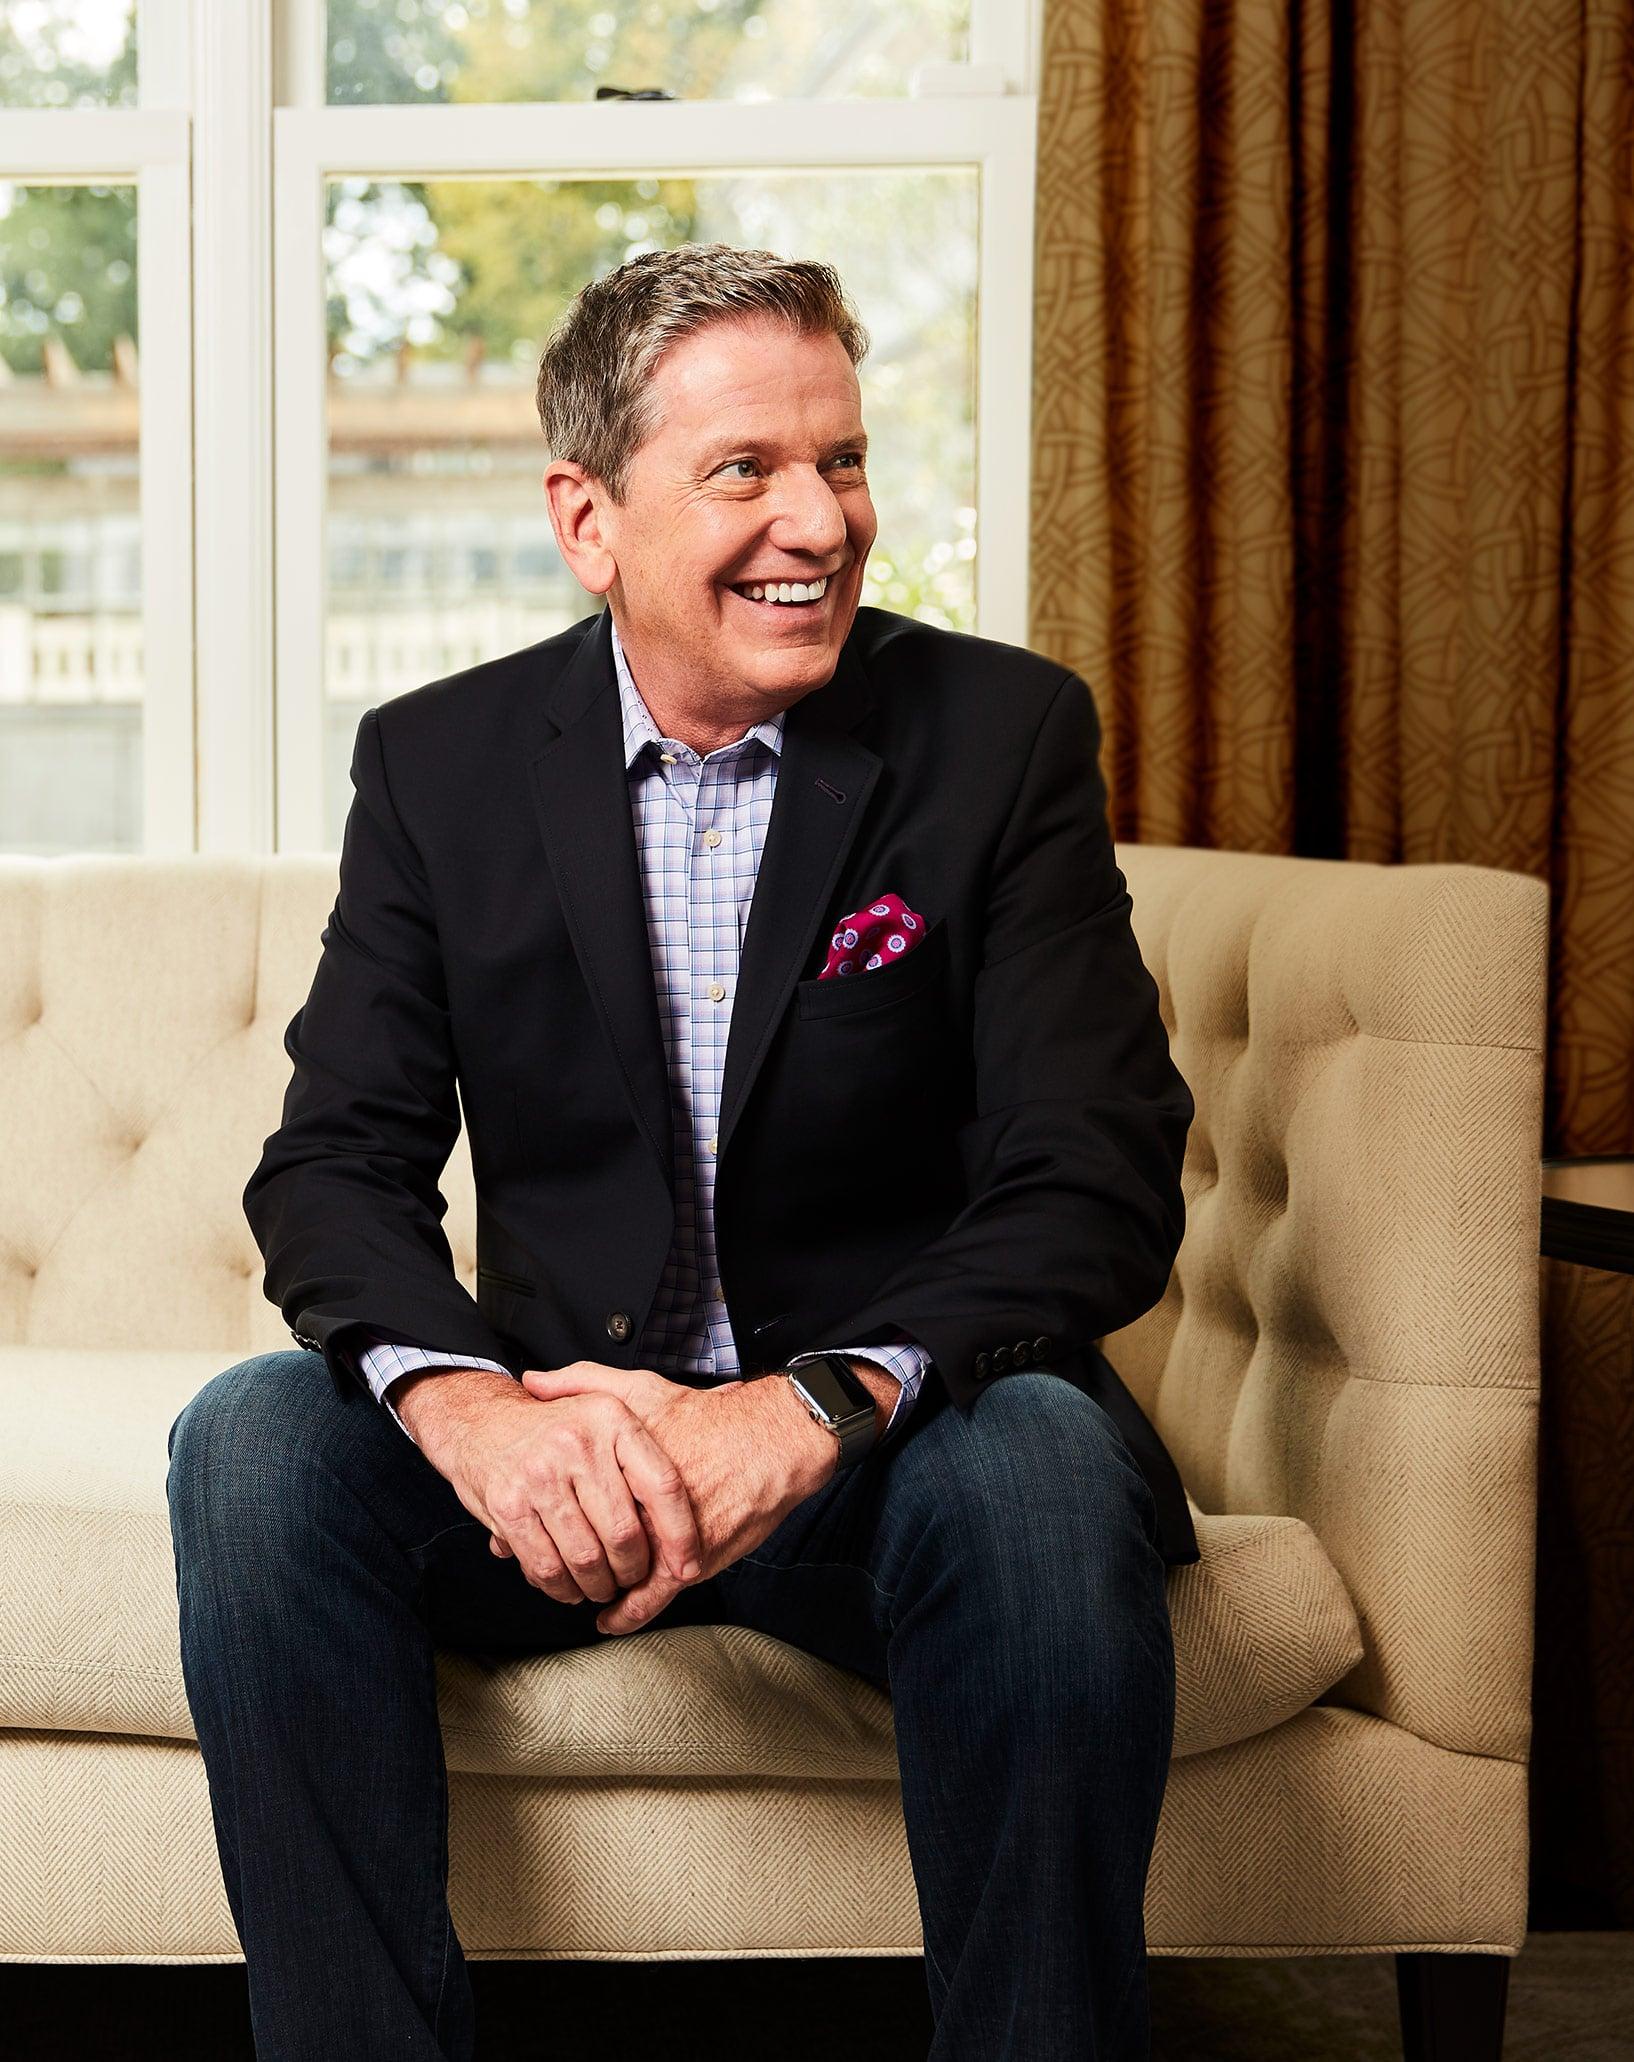 Michael Hyatt couch